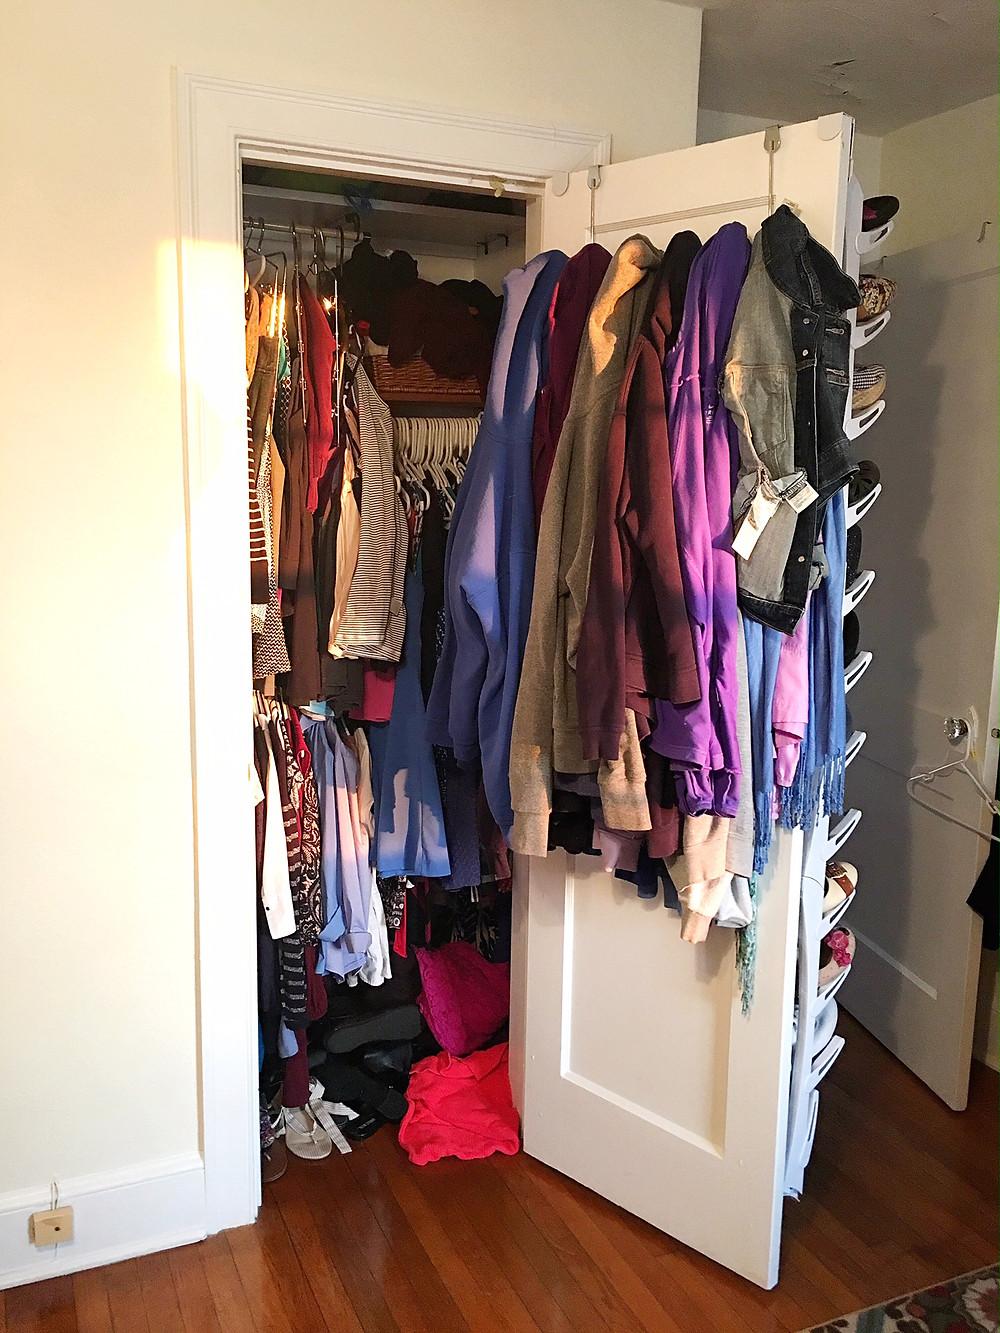 Closet Before Purging